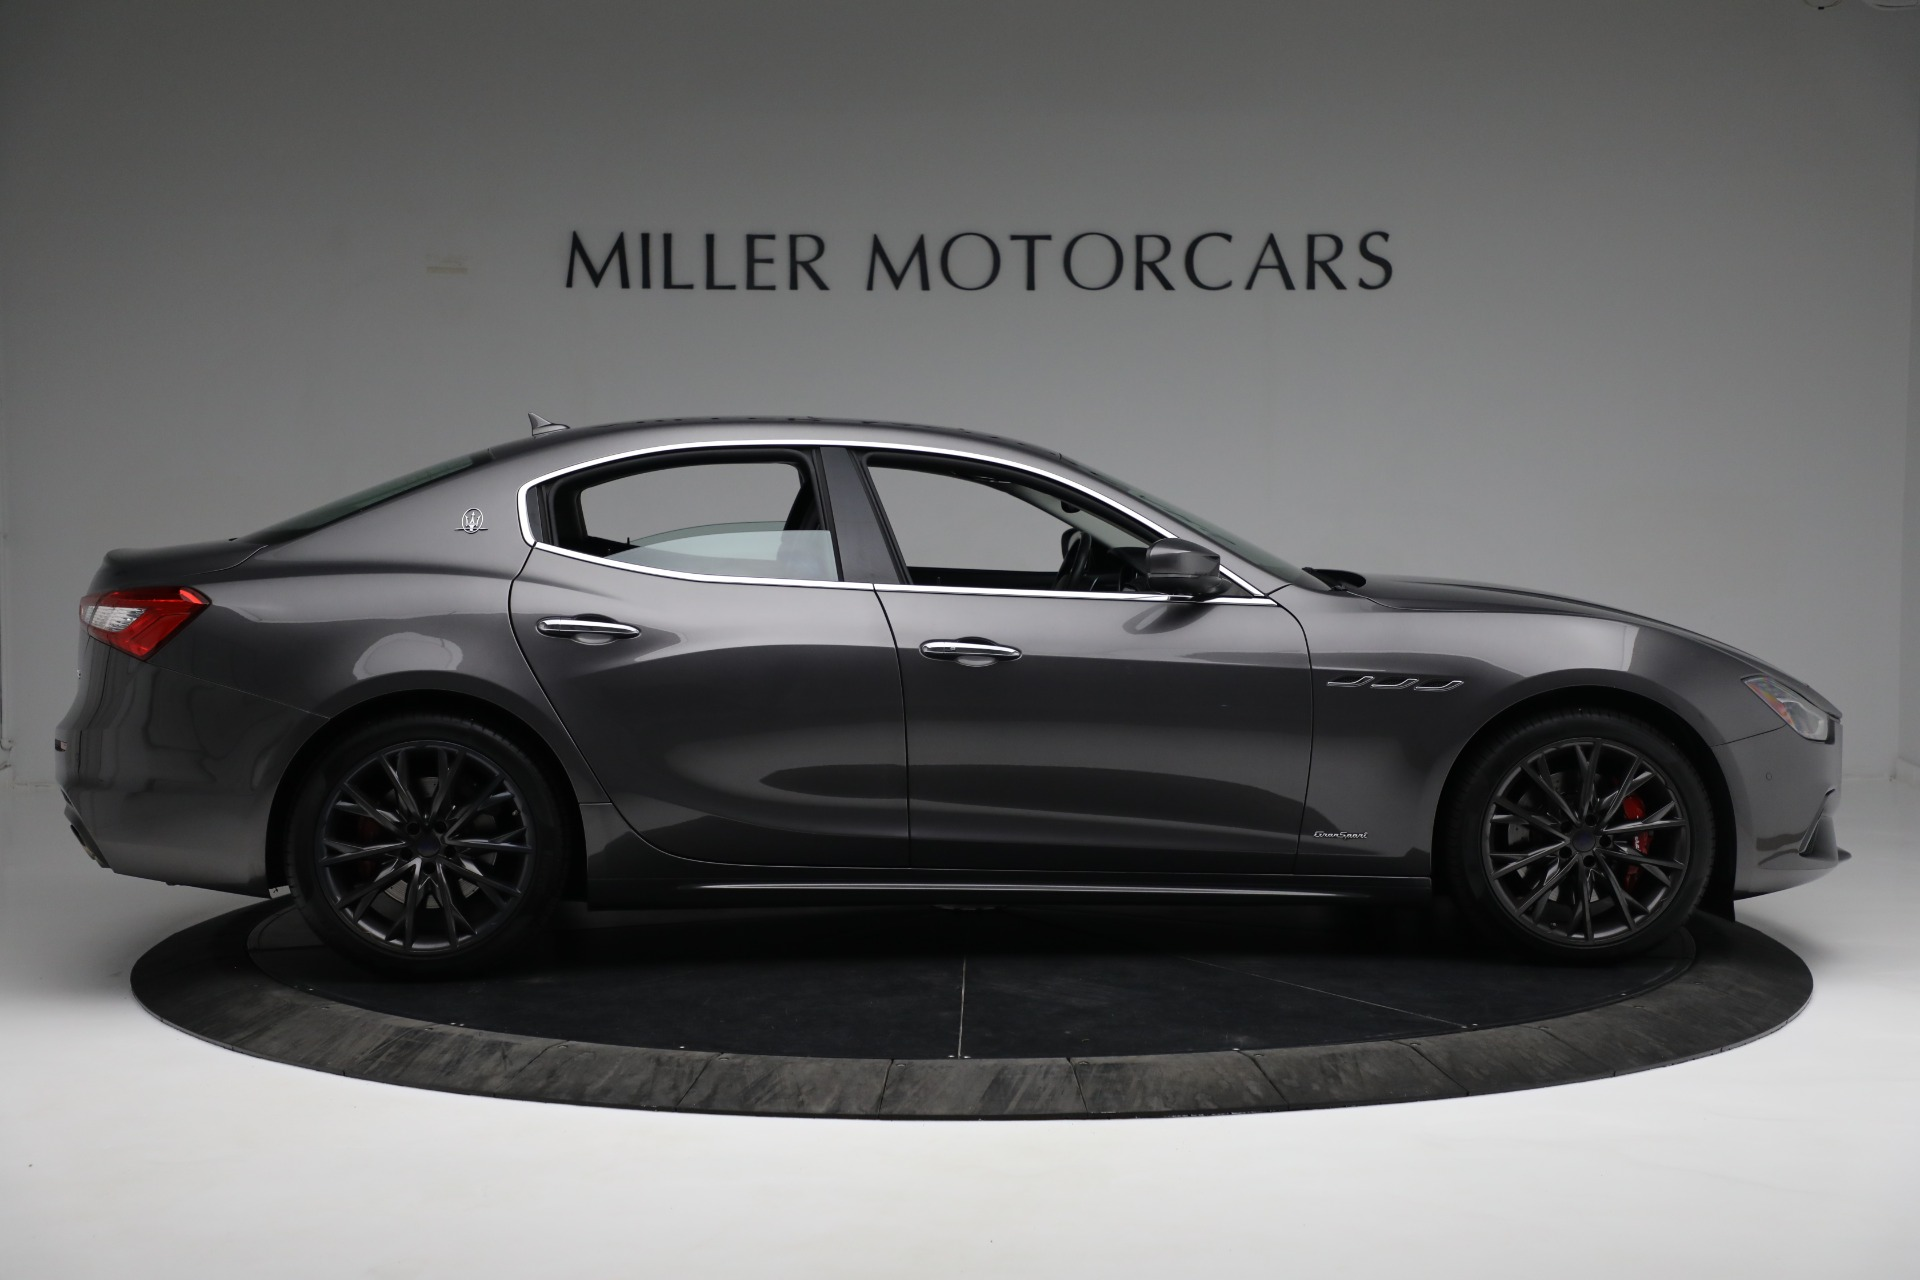 New 2019 Maserati Ghibli S Q4 GranSport For Sale In Greenwich, CT 3493_p9